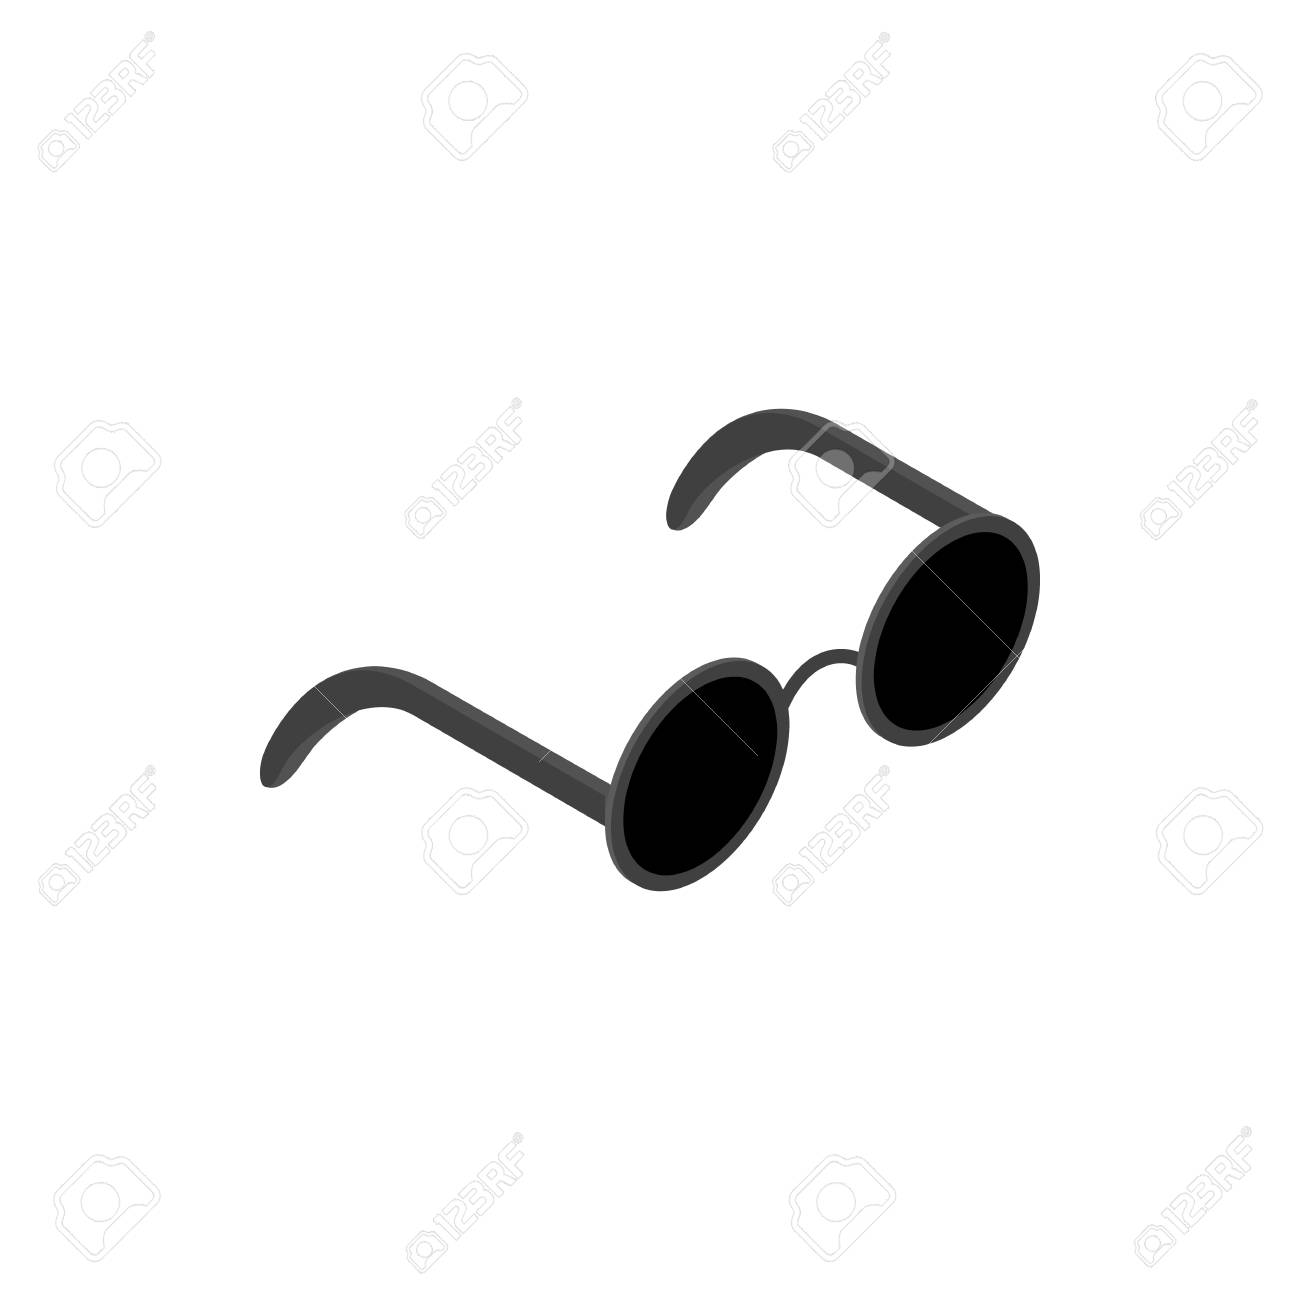 Gafas Con Lentes Redondas Icono Negro En Estilo Isométrica 3d Sobre ...